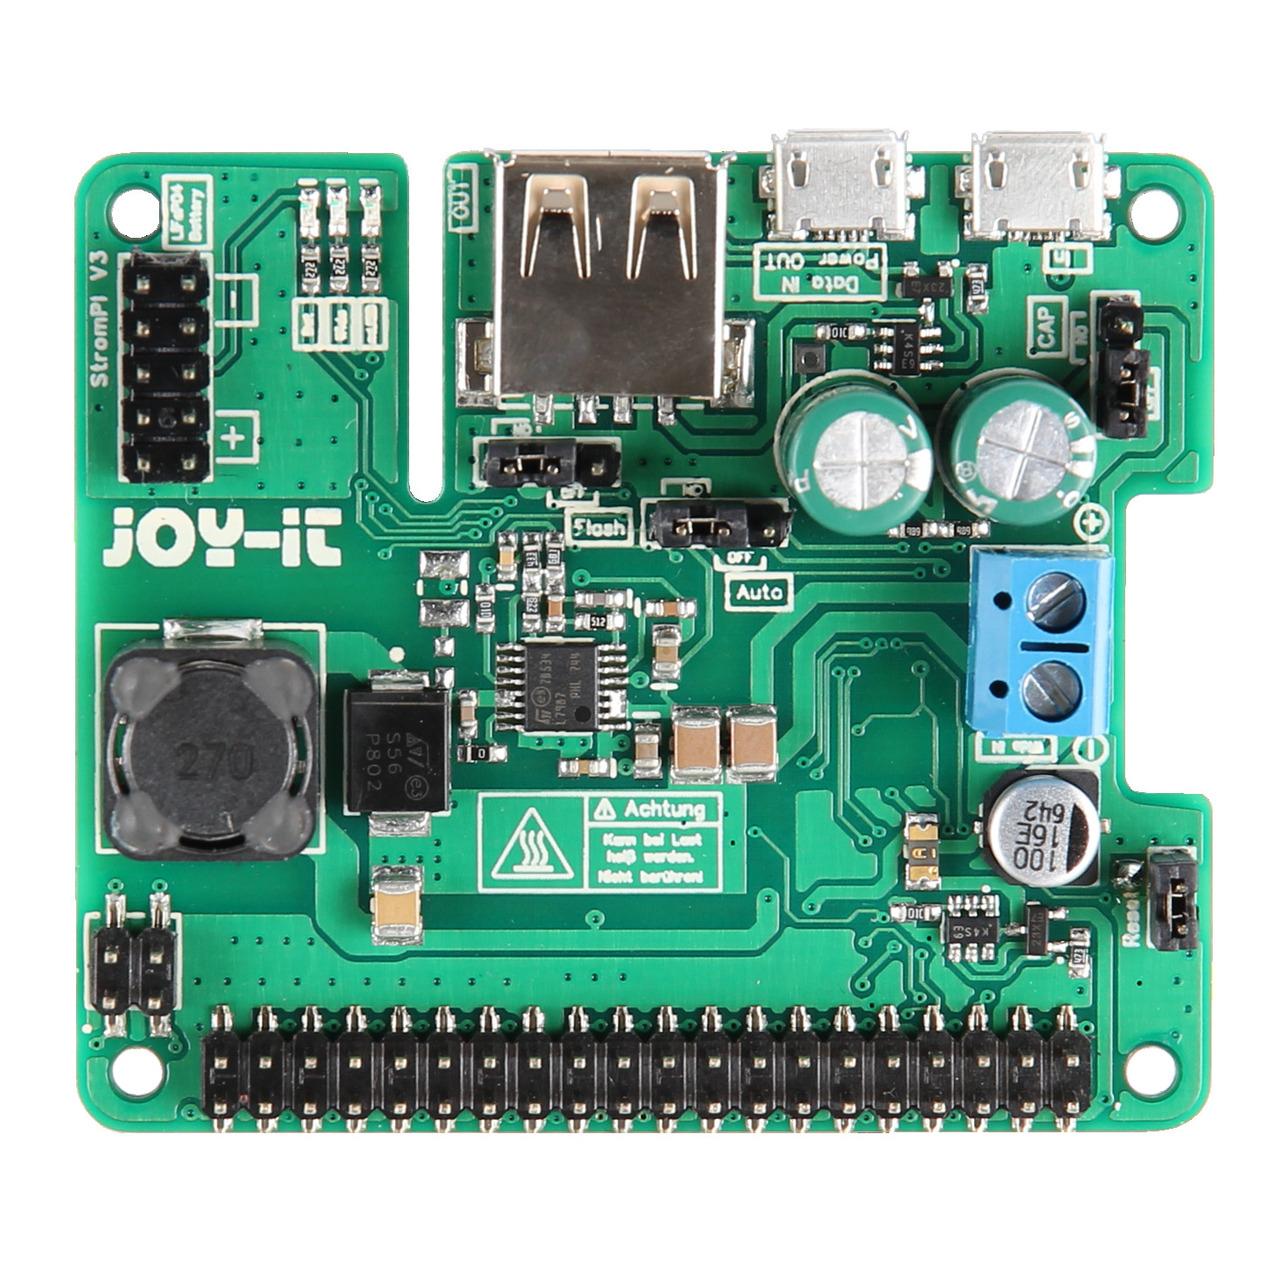 JOY-iT StromPi 3- Stromversorgung und USV fund-252 r Raspberry Pi